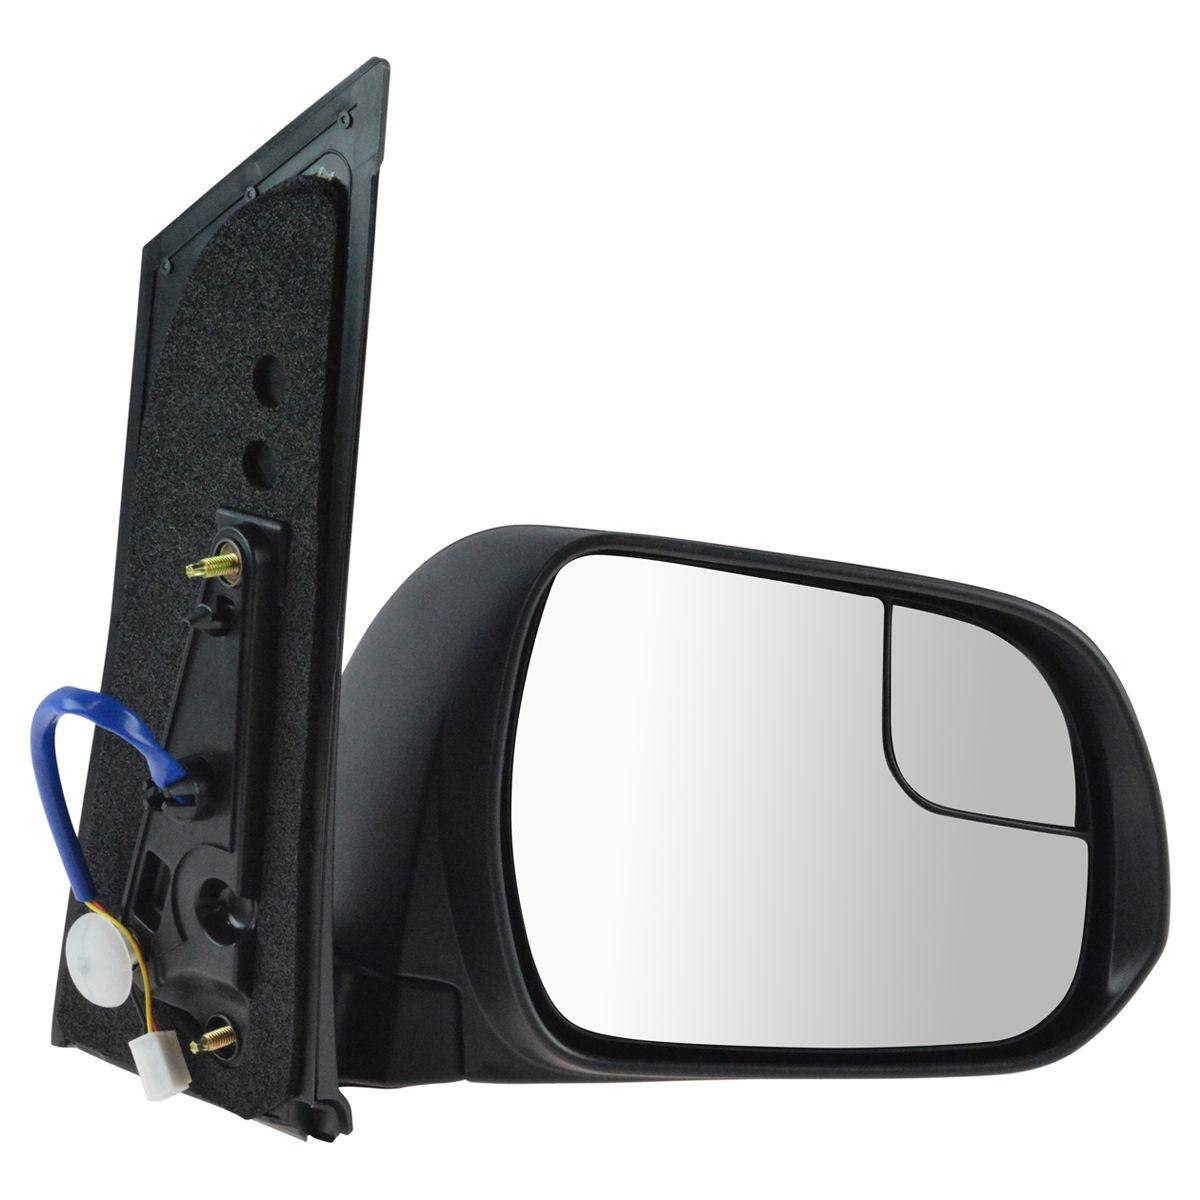 Genuine Toyota 87910-08150-J1 Rear View Mirror Assembly